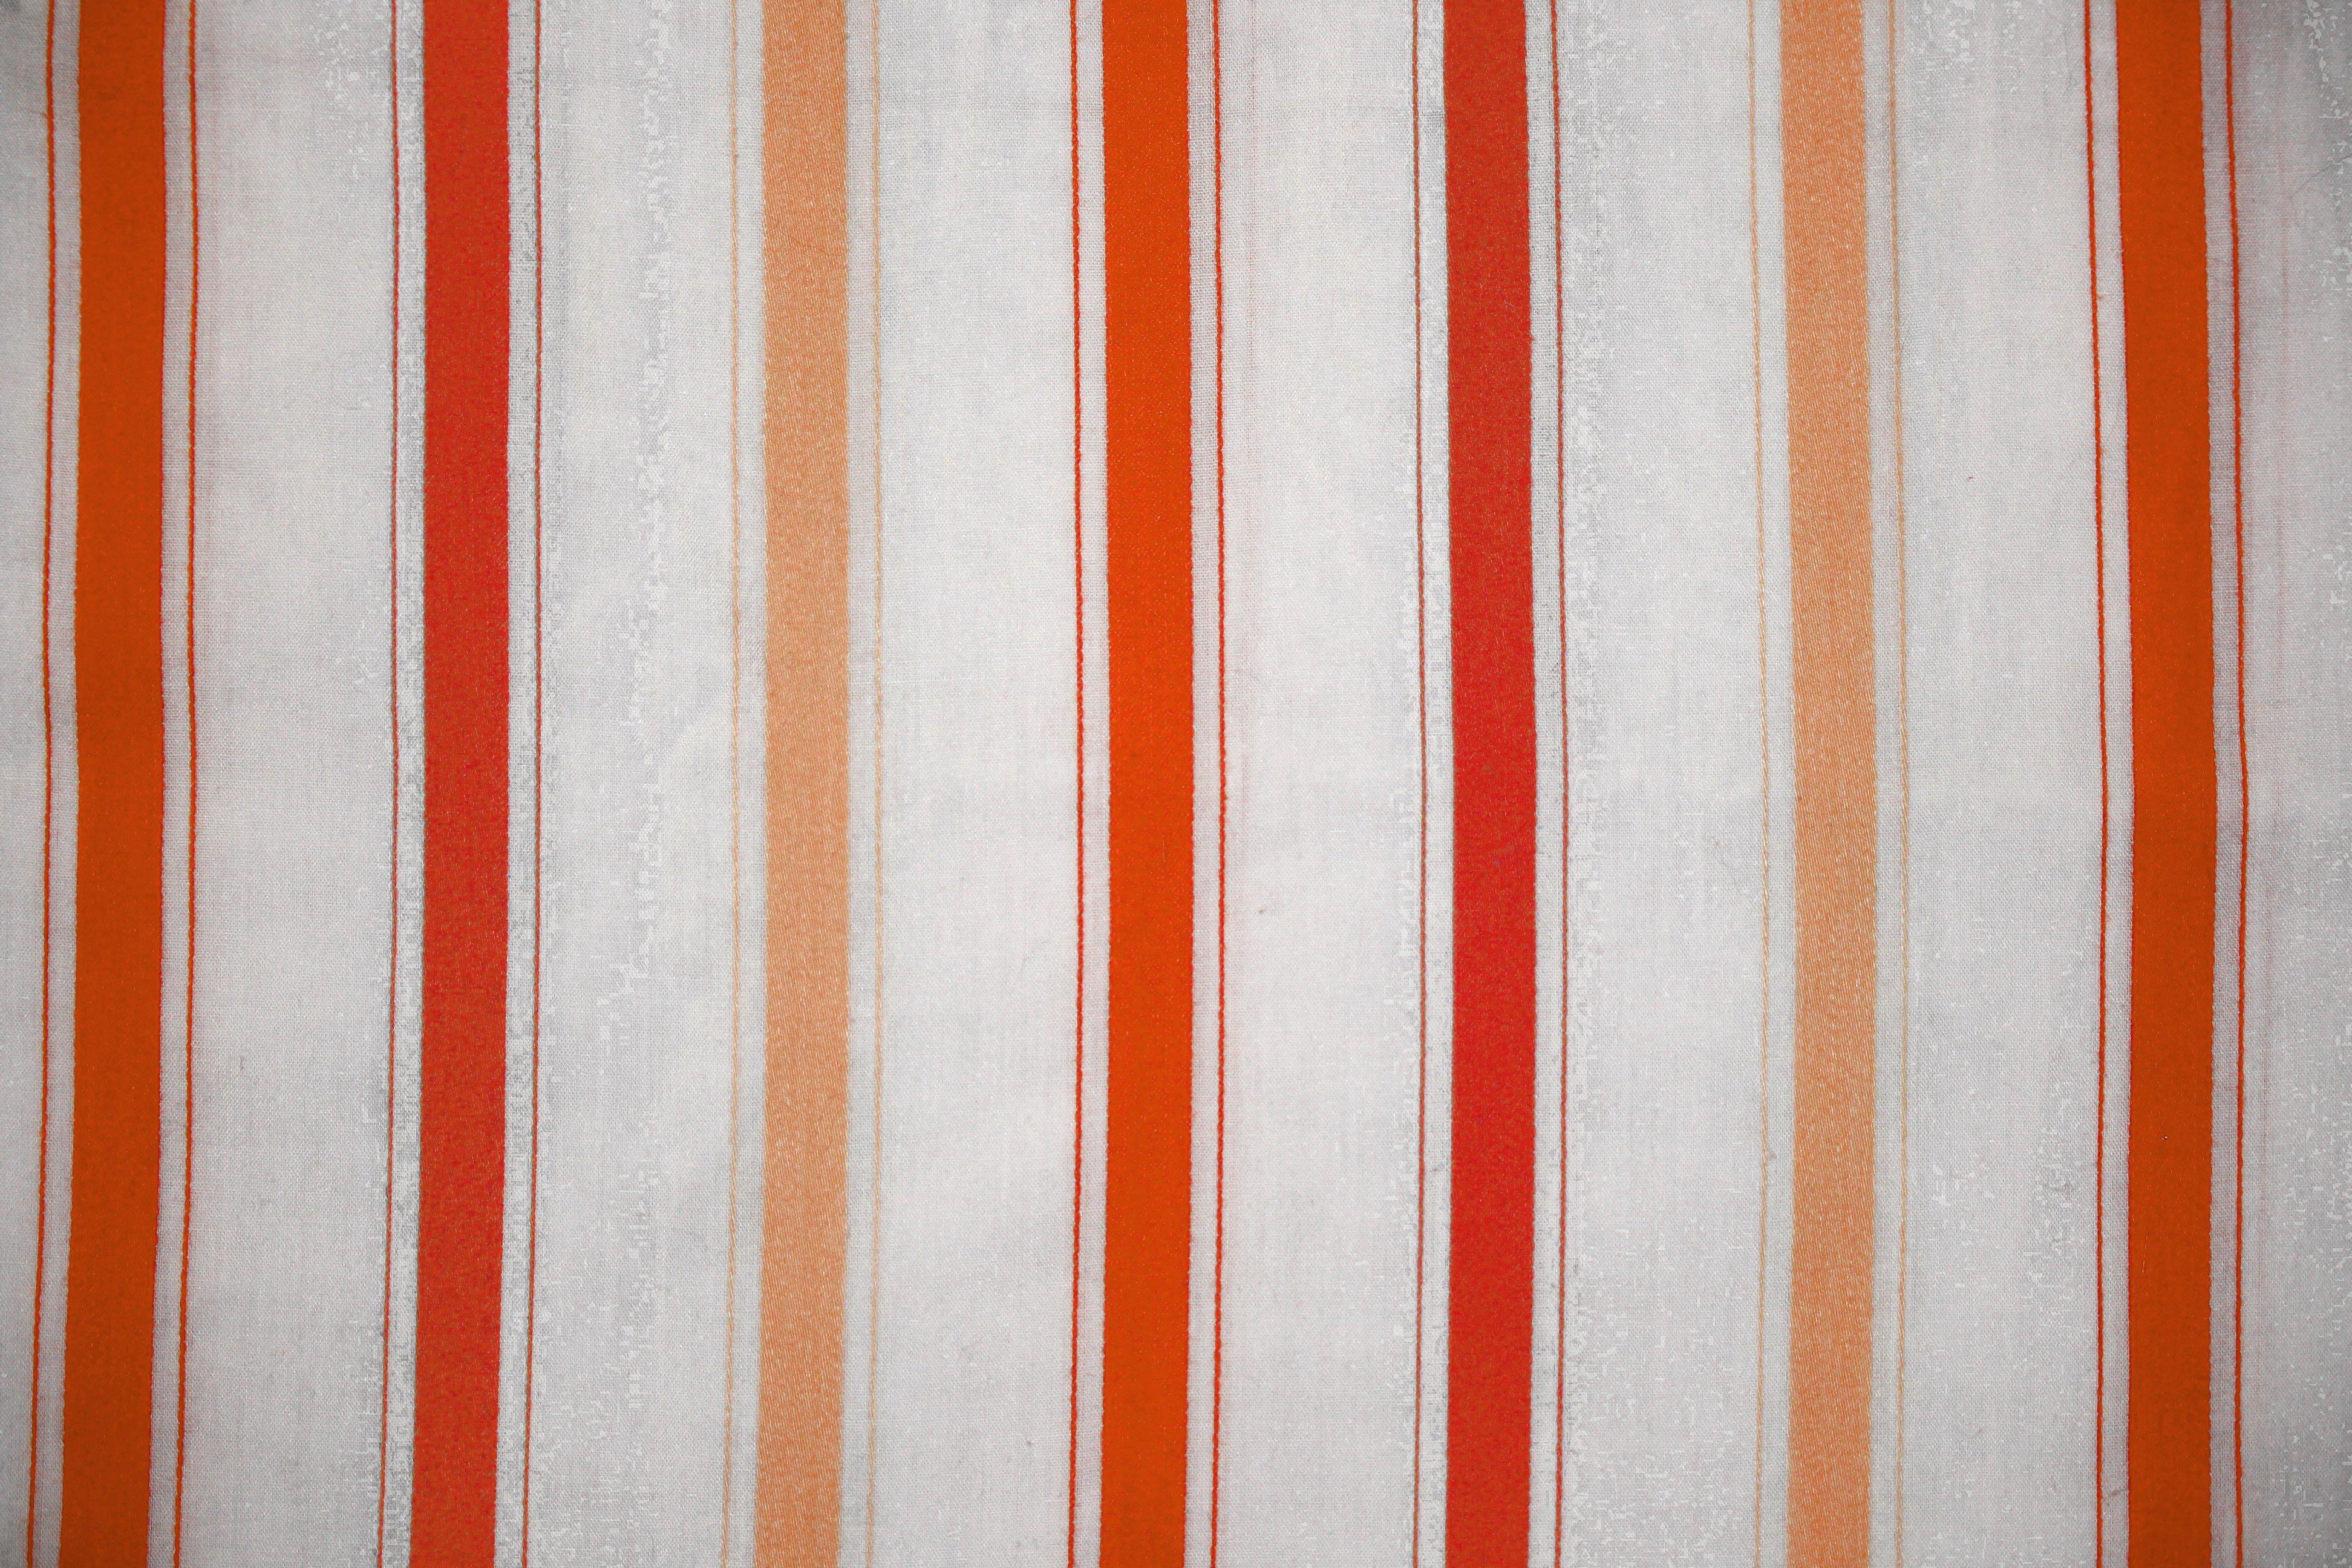 Striped Fabric Texture Orange On White Picture Free